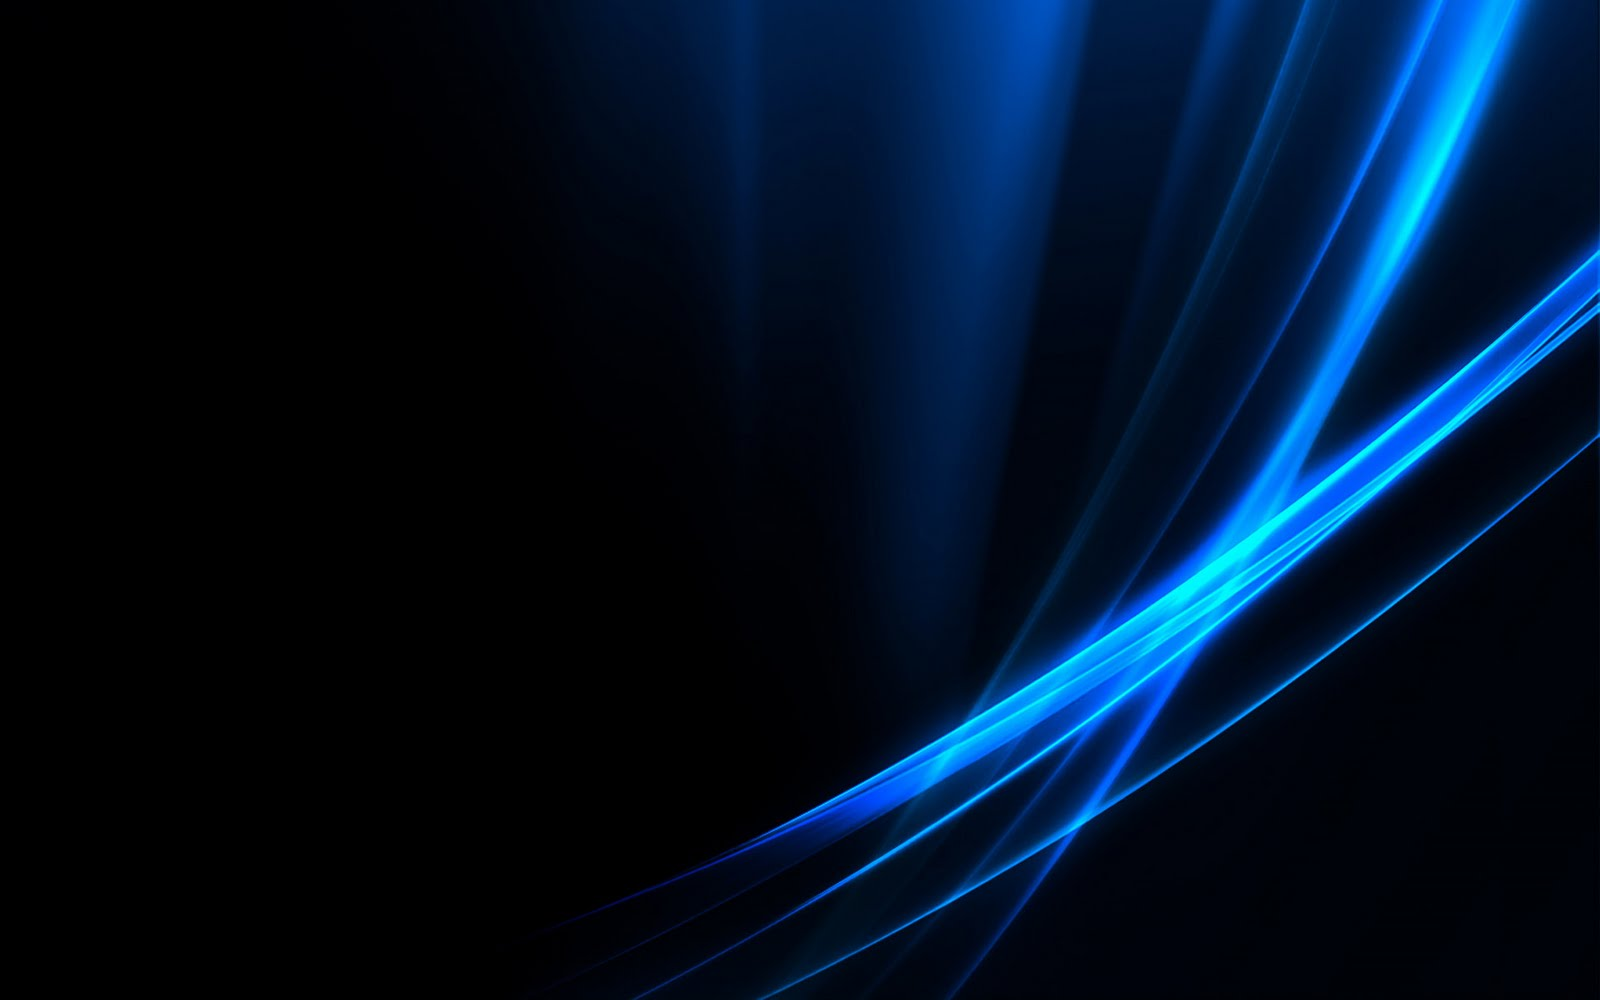 http://4.bp.blogspot.com/_91jzaTTtyts/S9KfvI9rqOI/AAAAAAAAA3Y/dPrflrfzhfo/s1600/negro-azul-wallpaper.jpg